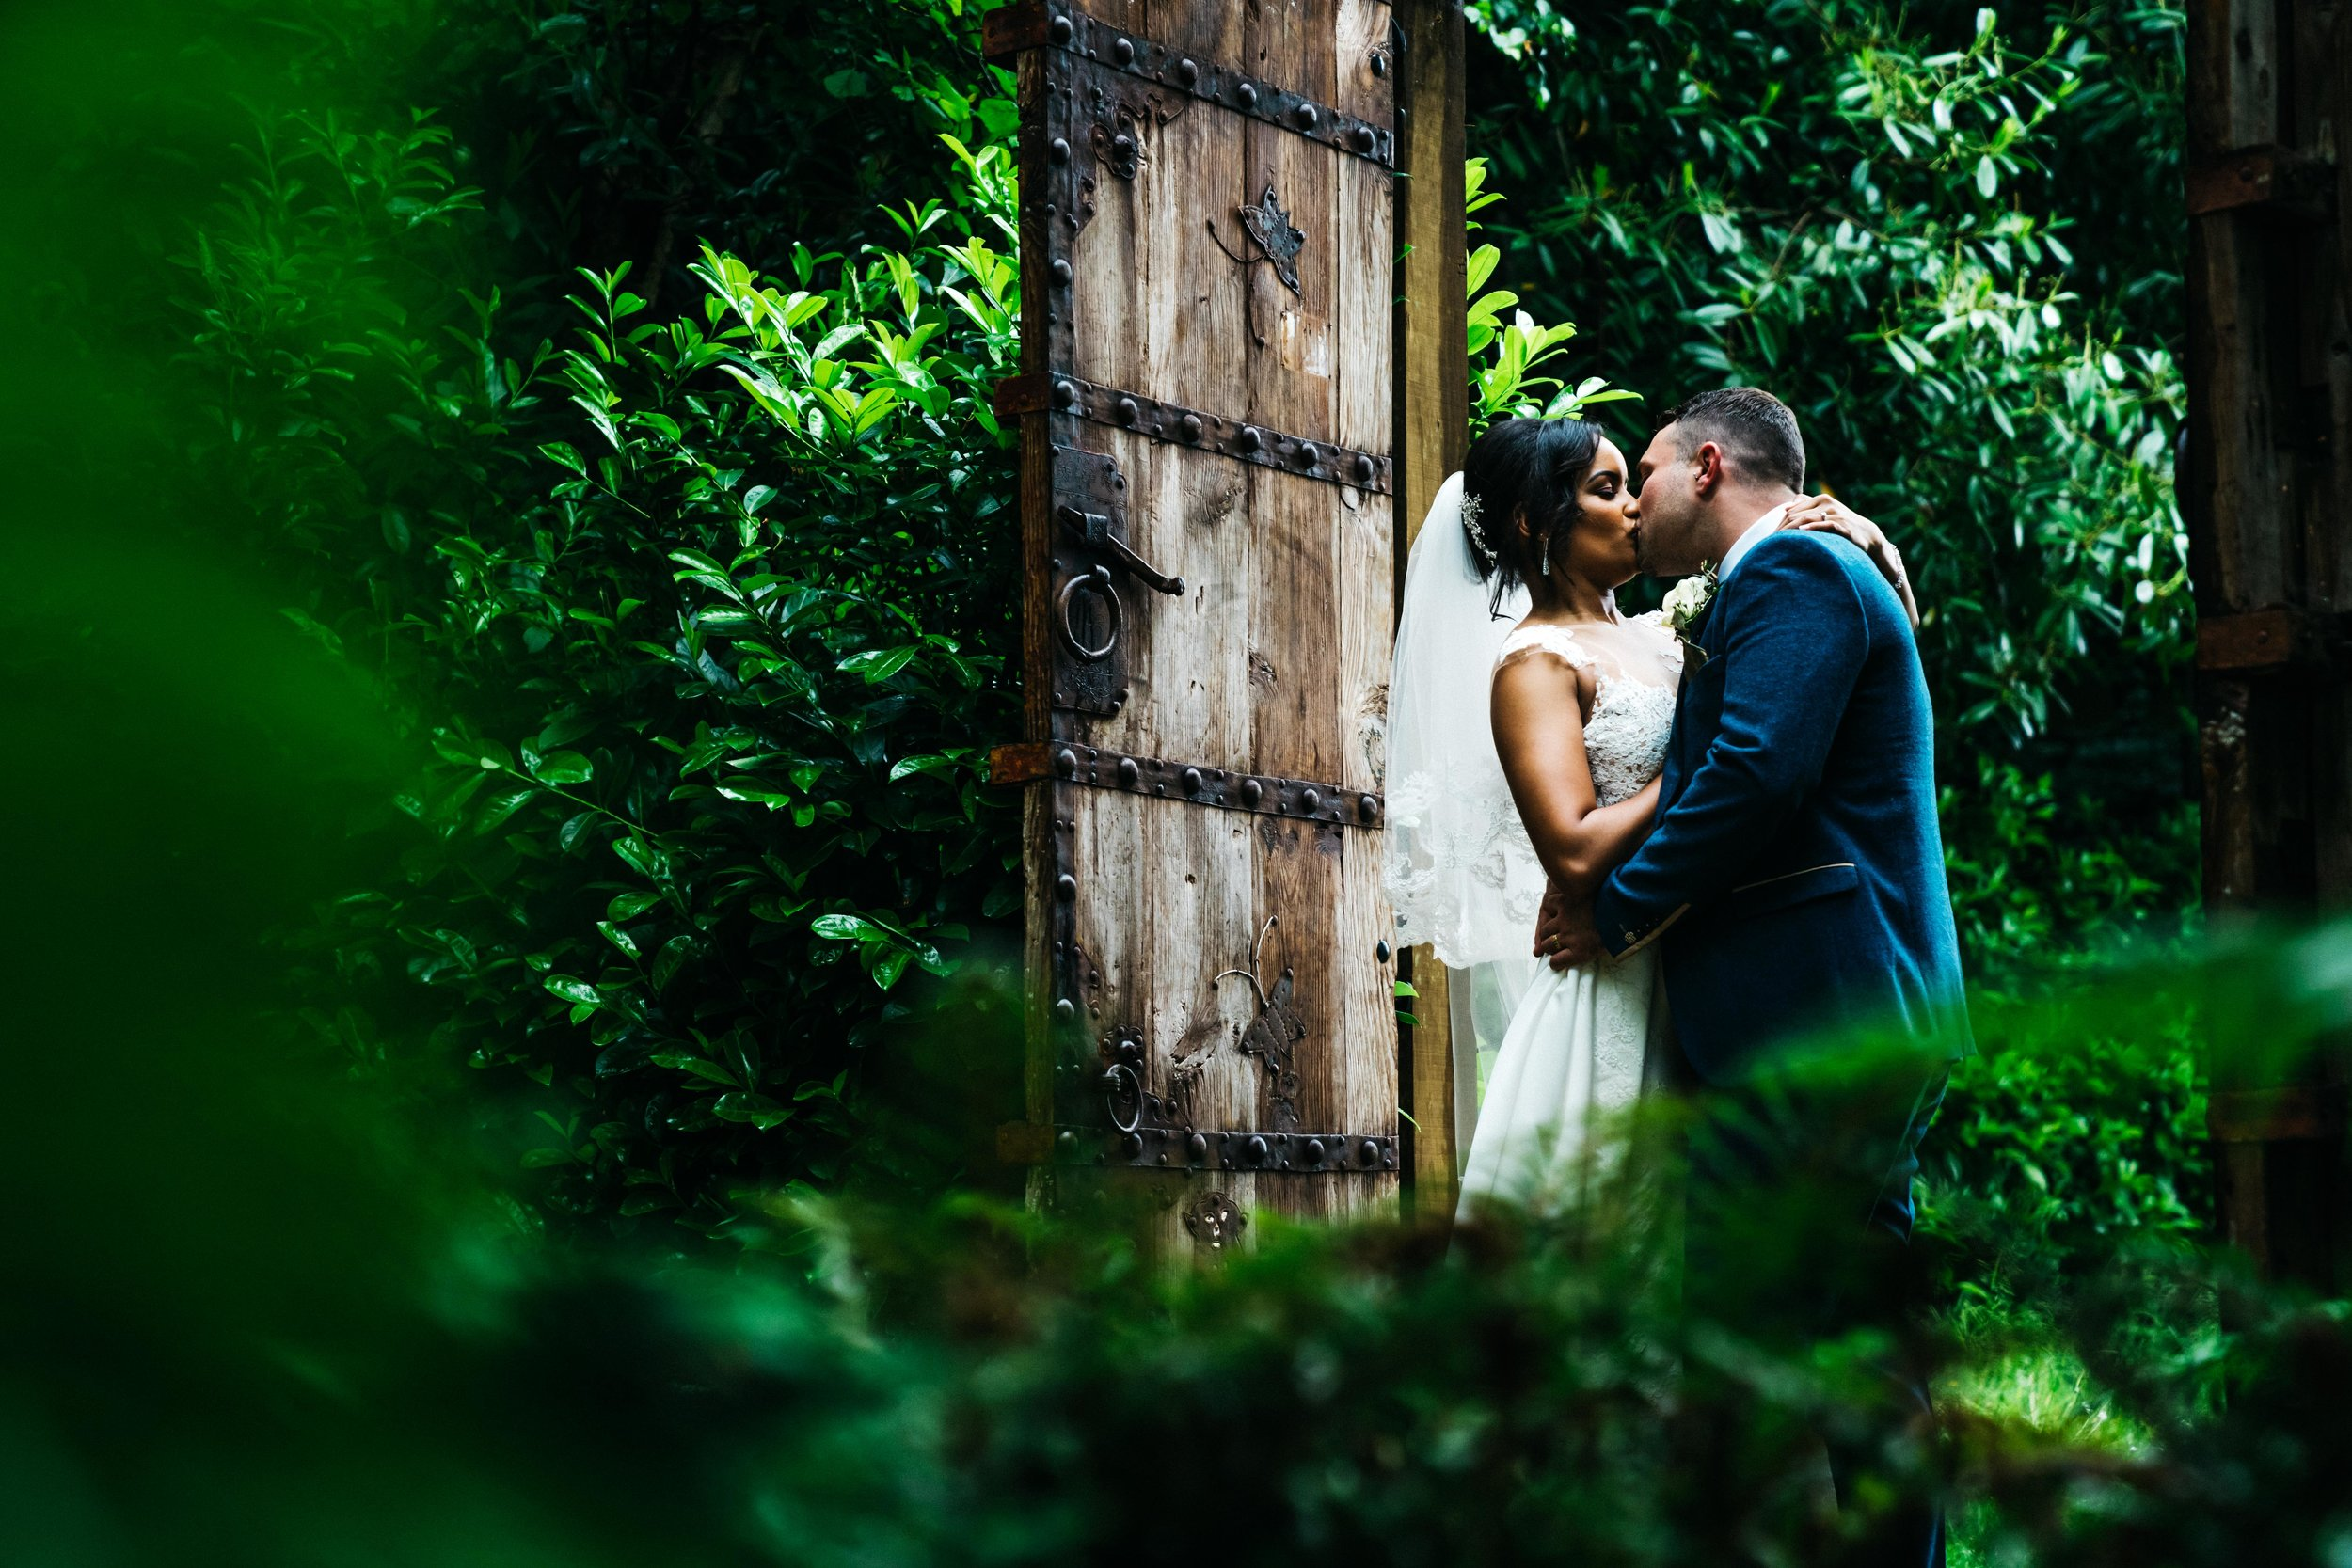 kent-wedding-photographer-207030.jpg